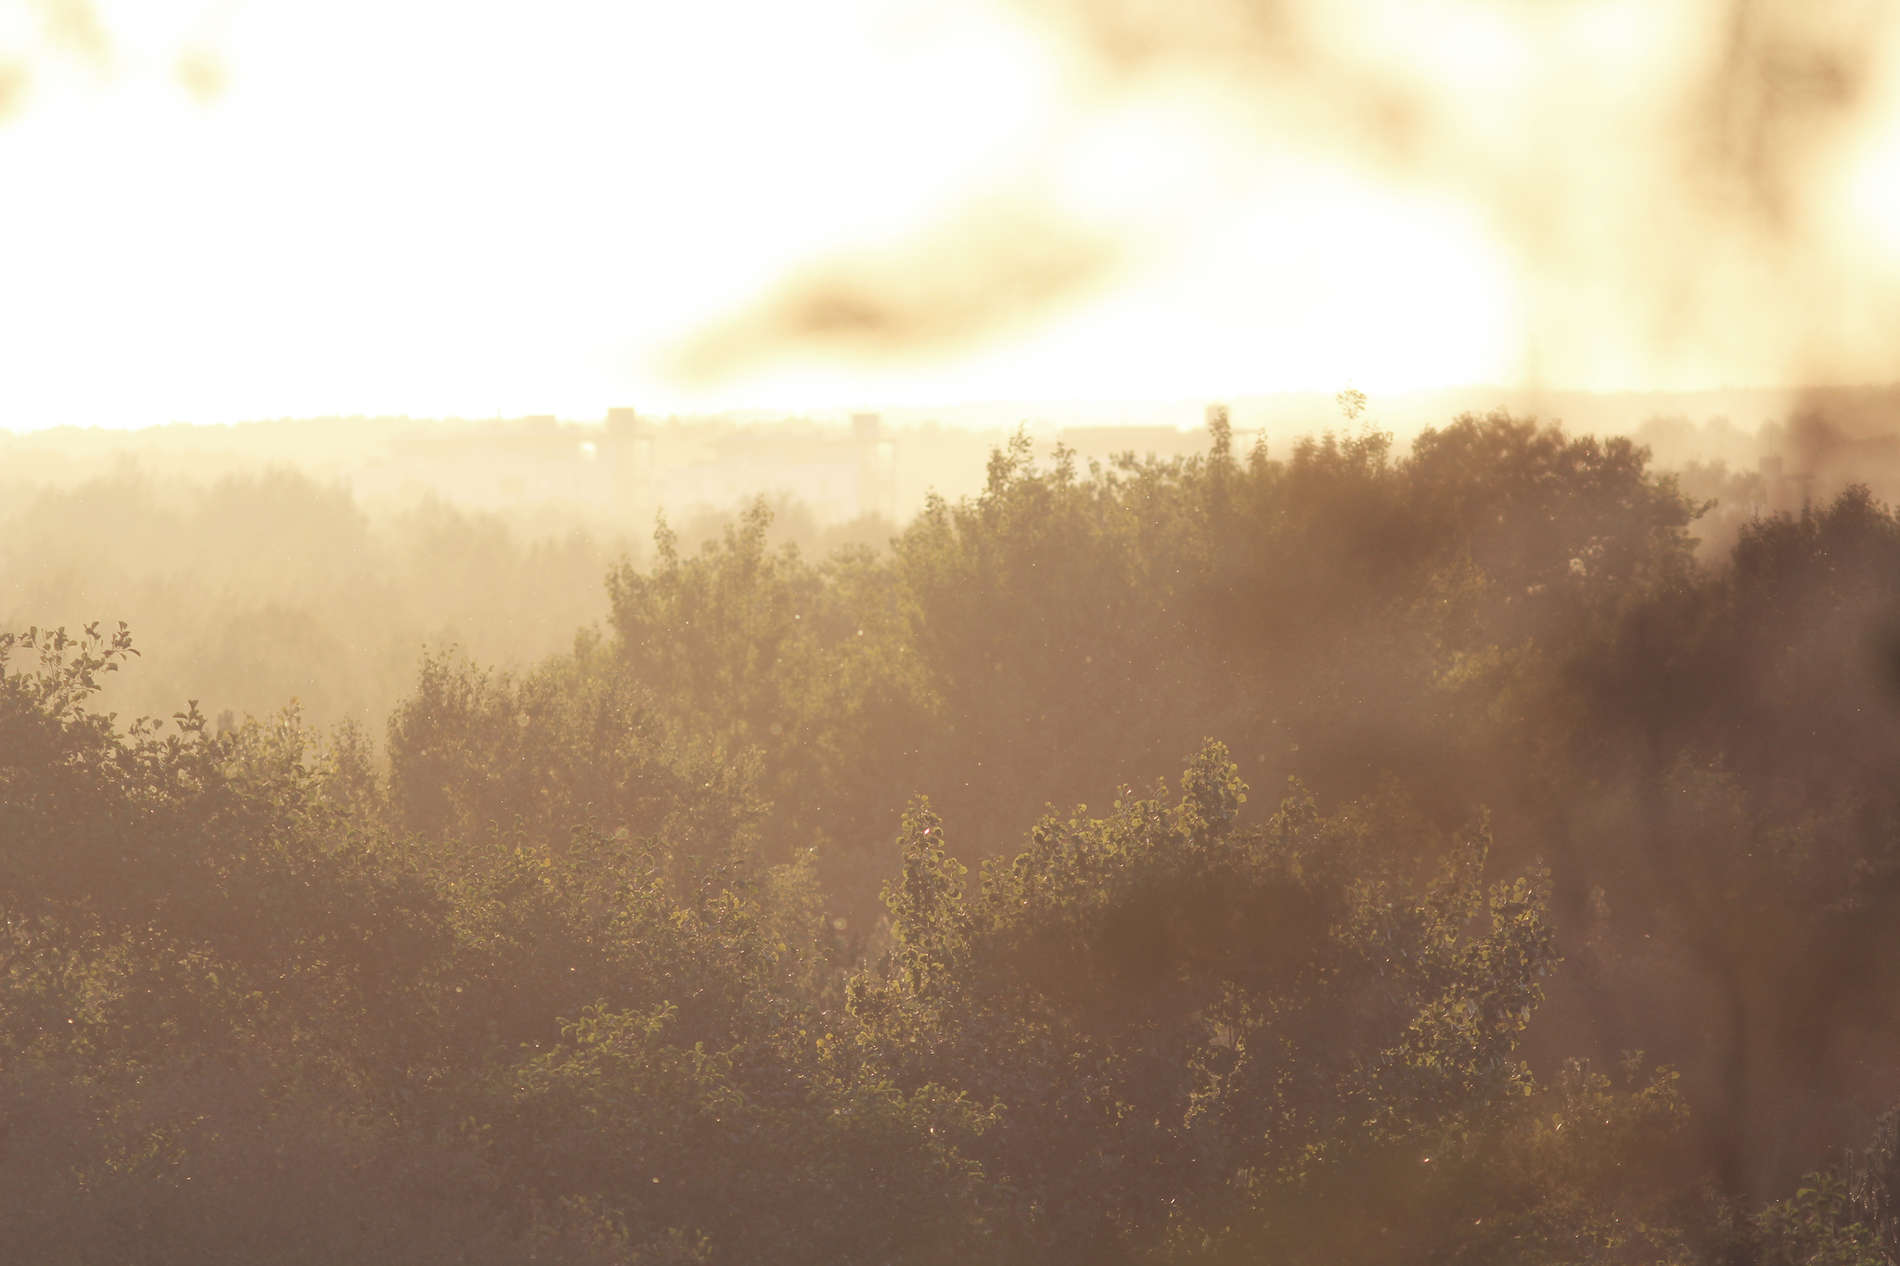 Naturschutzgebiet Nõmme-Mustamäe